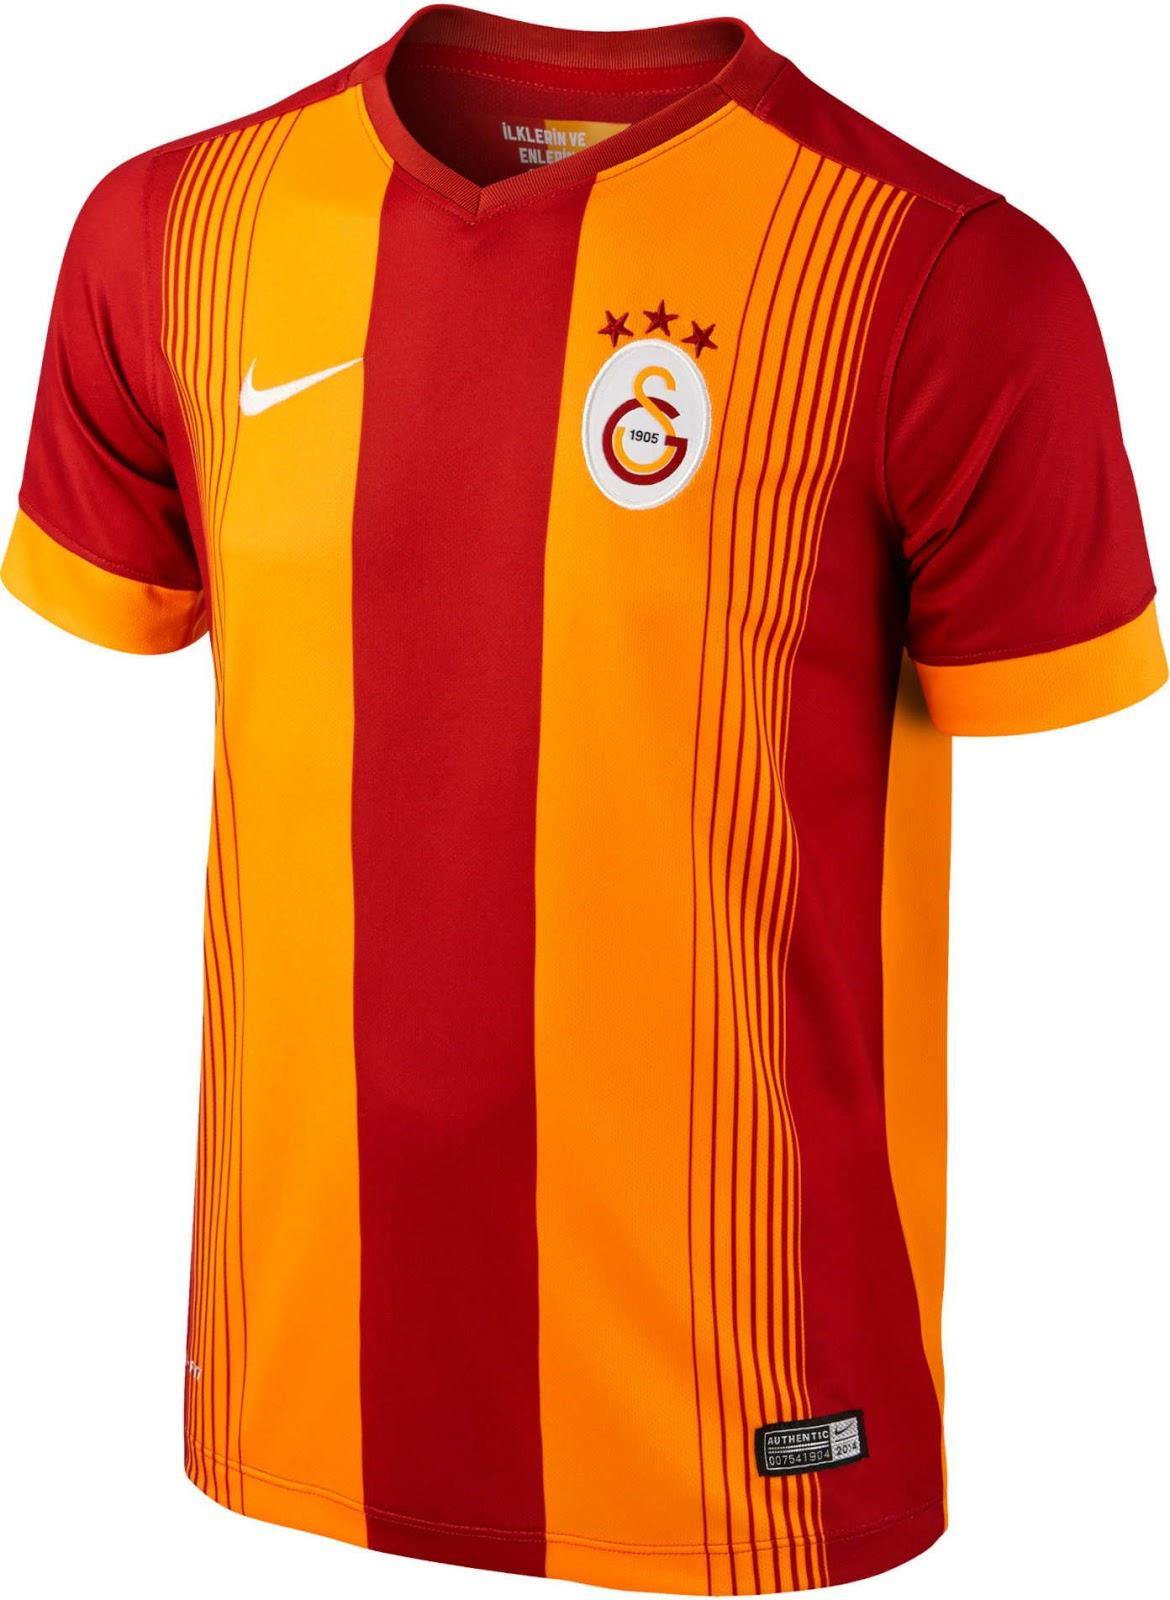 http://3.bp.blogspot.com/-DGuocSlf8gE/U8jc1MUd7FI/AAAAAAAAUY4/YZXGgzQr5k8/s1600/Galatasaray-14-15-Home-Kit+(1).jpg